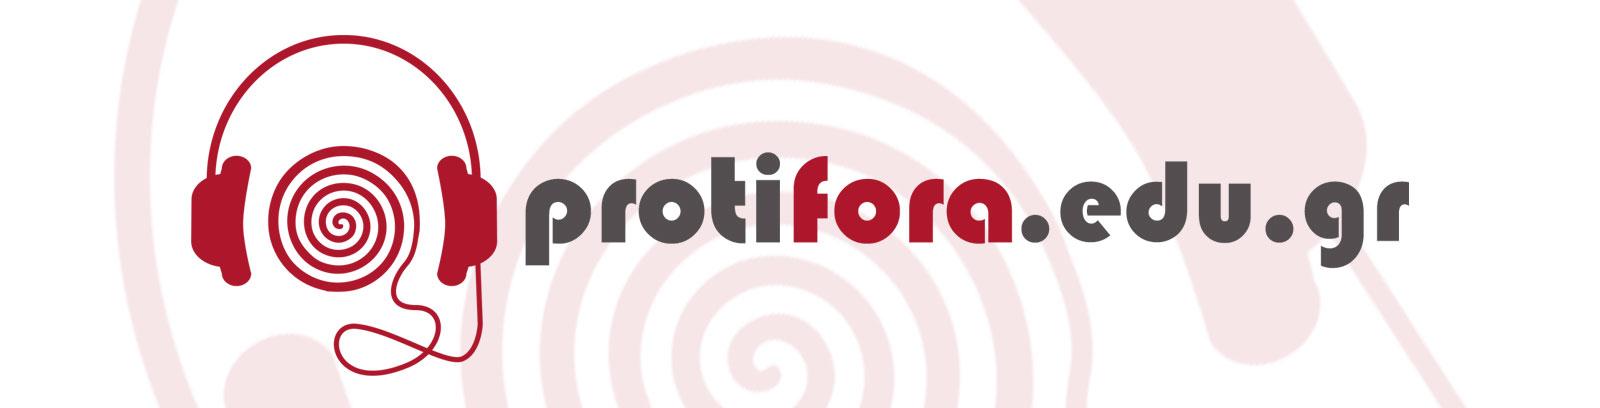 protifora.edu.gr logo